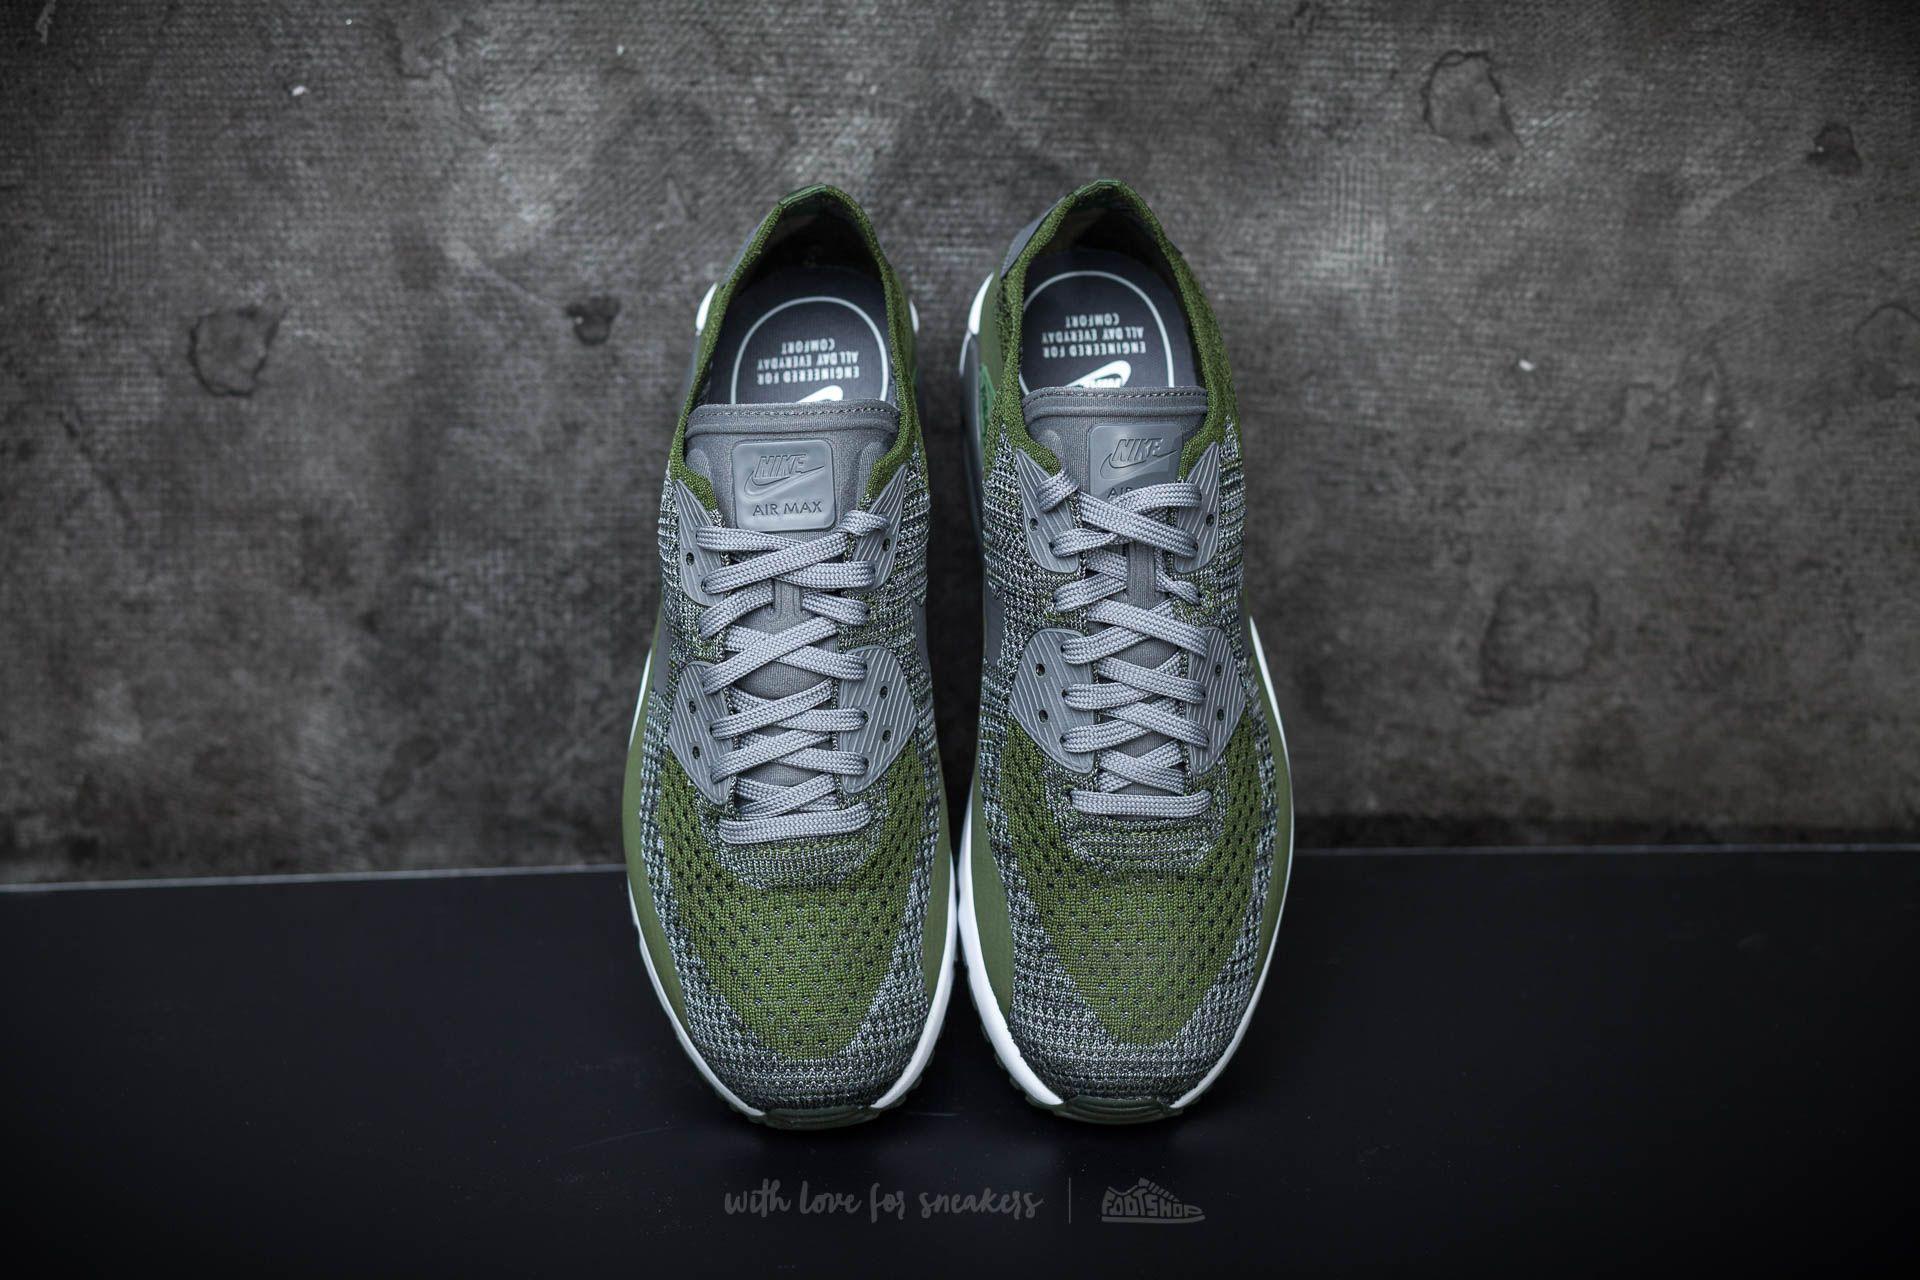 best sneakers 557e5 c9da6 Nike Air Max 90 Ultra 2.0 Flyknit Rough Green/ Dark Grey ...